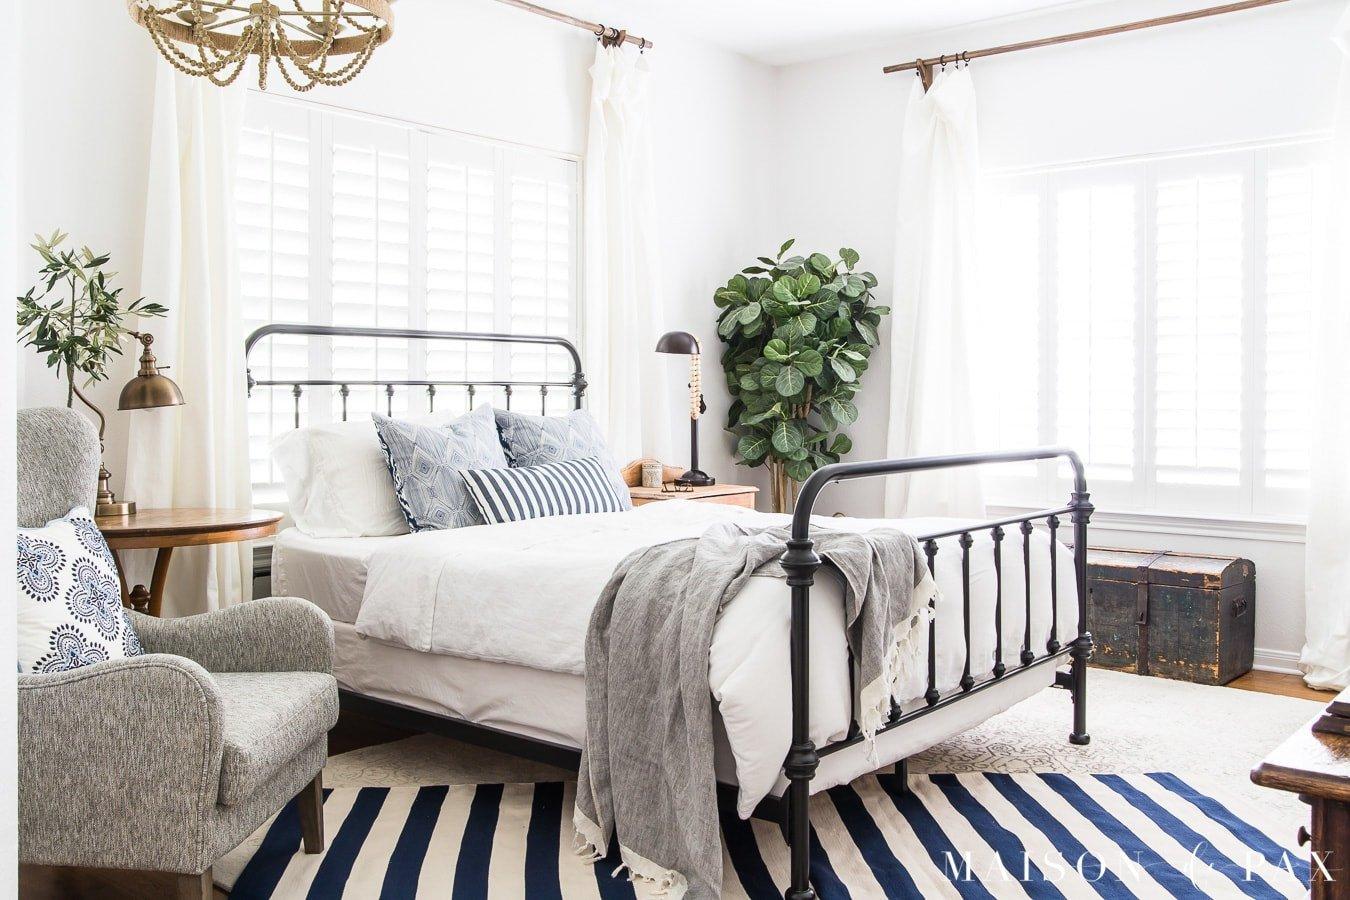 Blue and White Room Decor Unique Blue and White Bedroom Ideas for Summer Maison De Pax